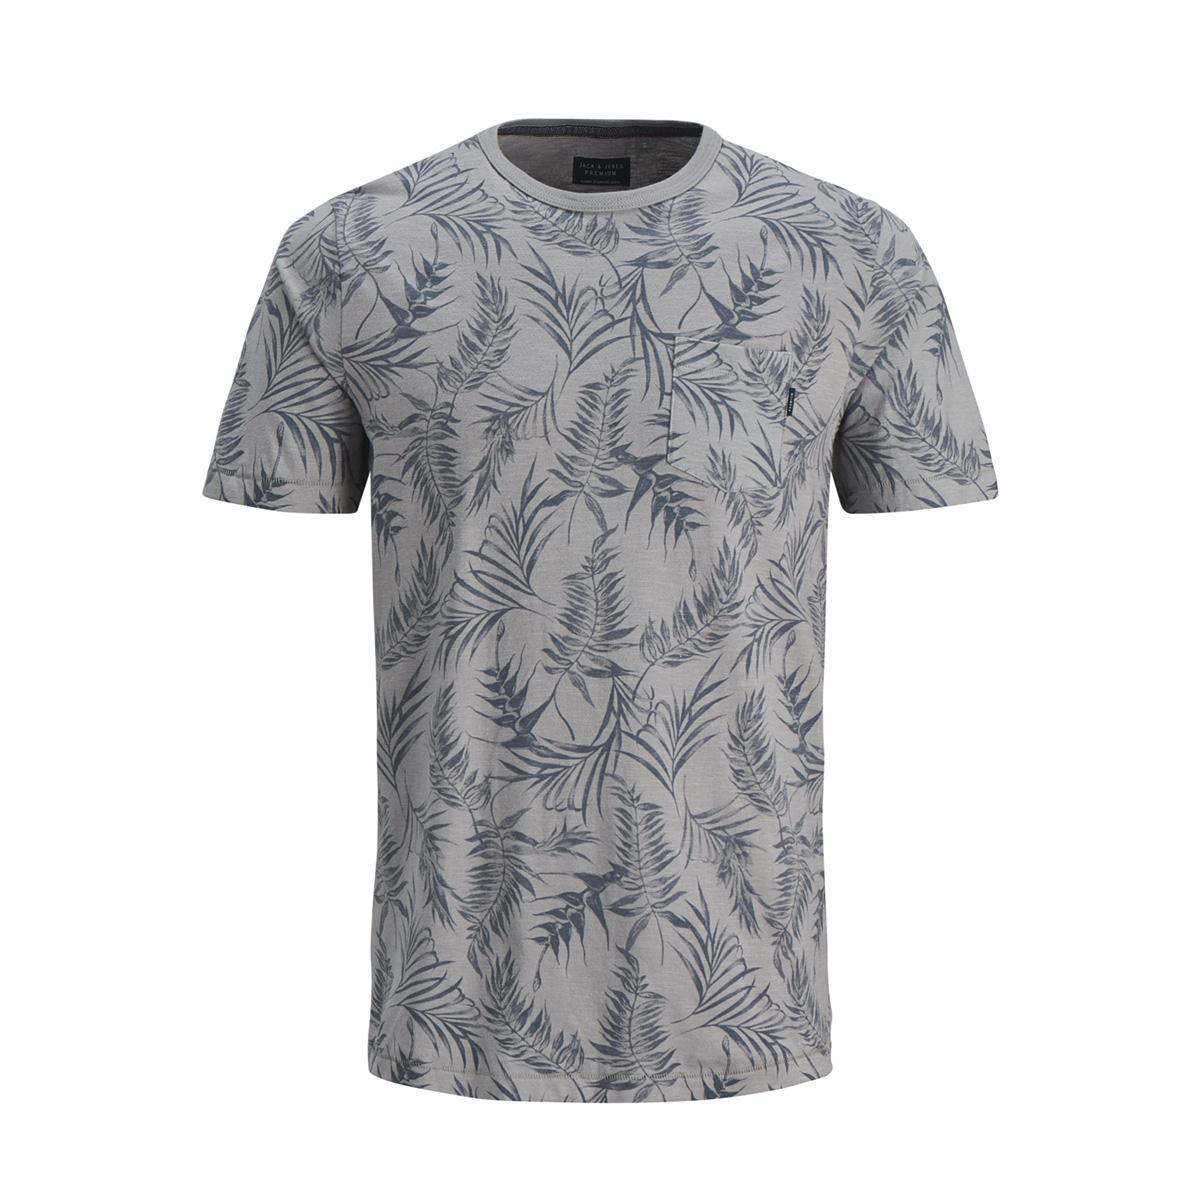 jprsean. blu. tee ss crew neck 12149369 jack & jones t-shirt griffin